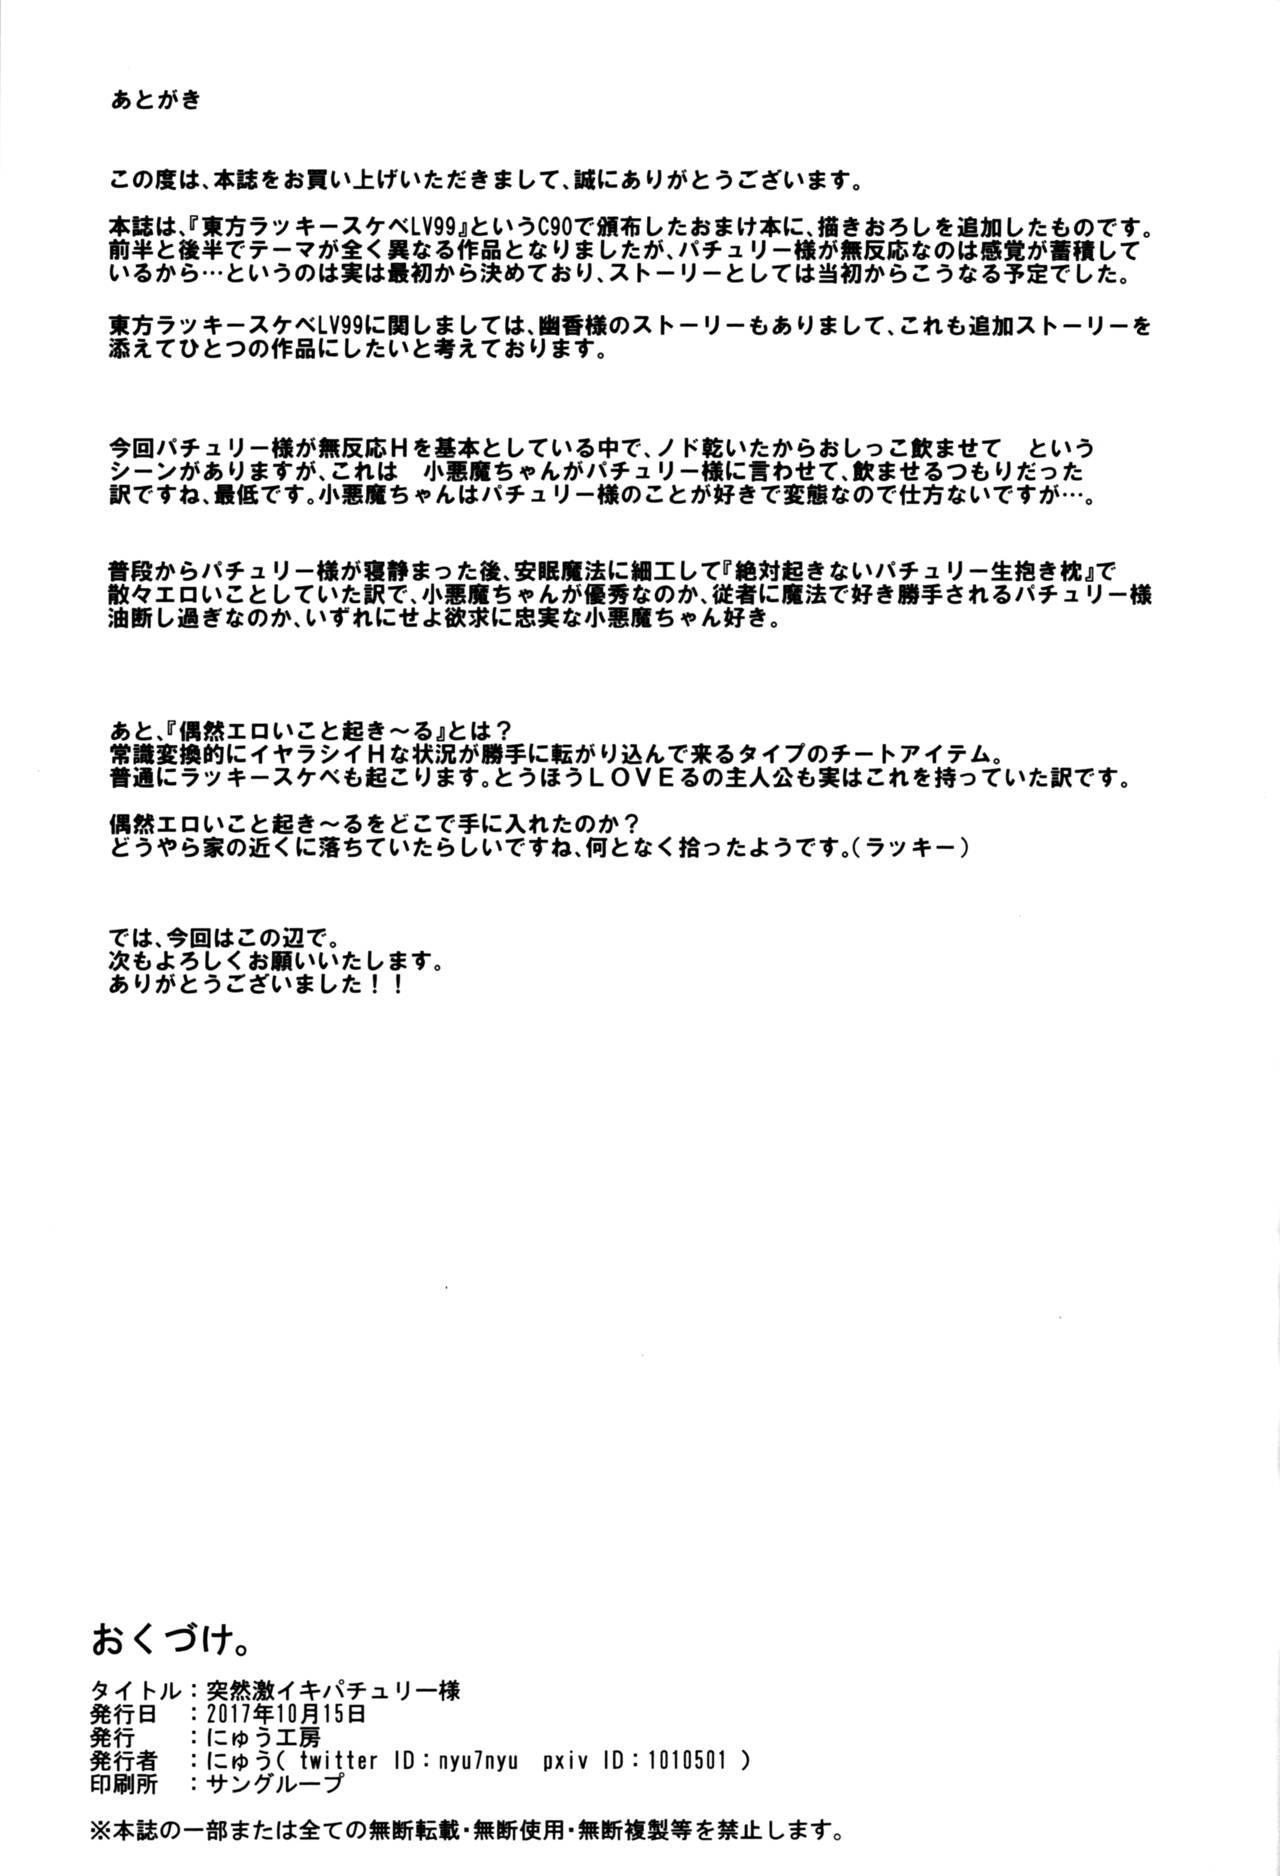 (Shuuki Reitaisai 4) [Nyuu Koubou (Nyuu)] Totsuzen Gekiiki Patchouli-sama | Suddenly Patchouli-sama Violently Came (Touhou Project) [English] [Doujins.com] 19